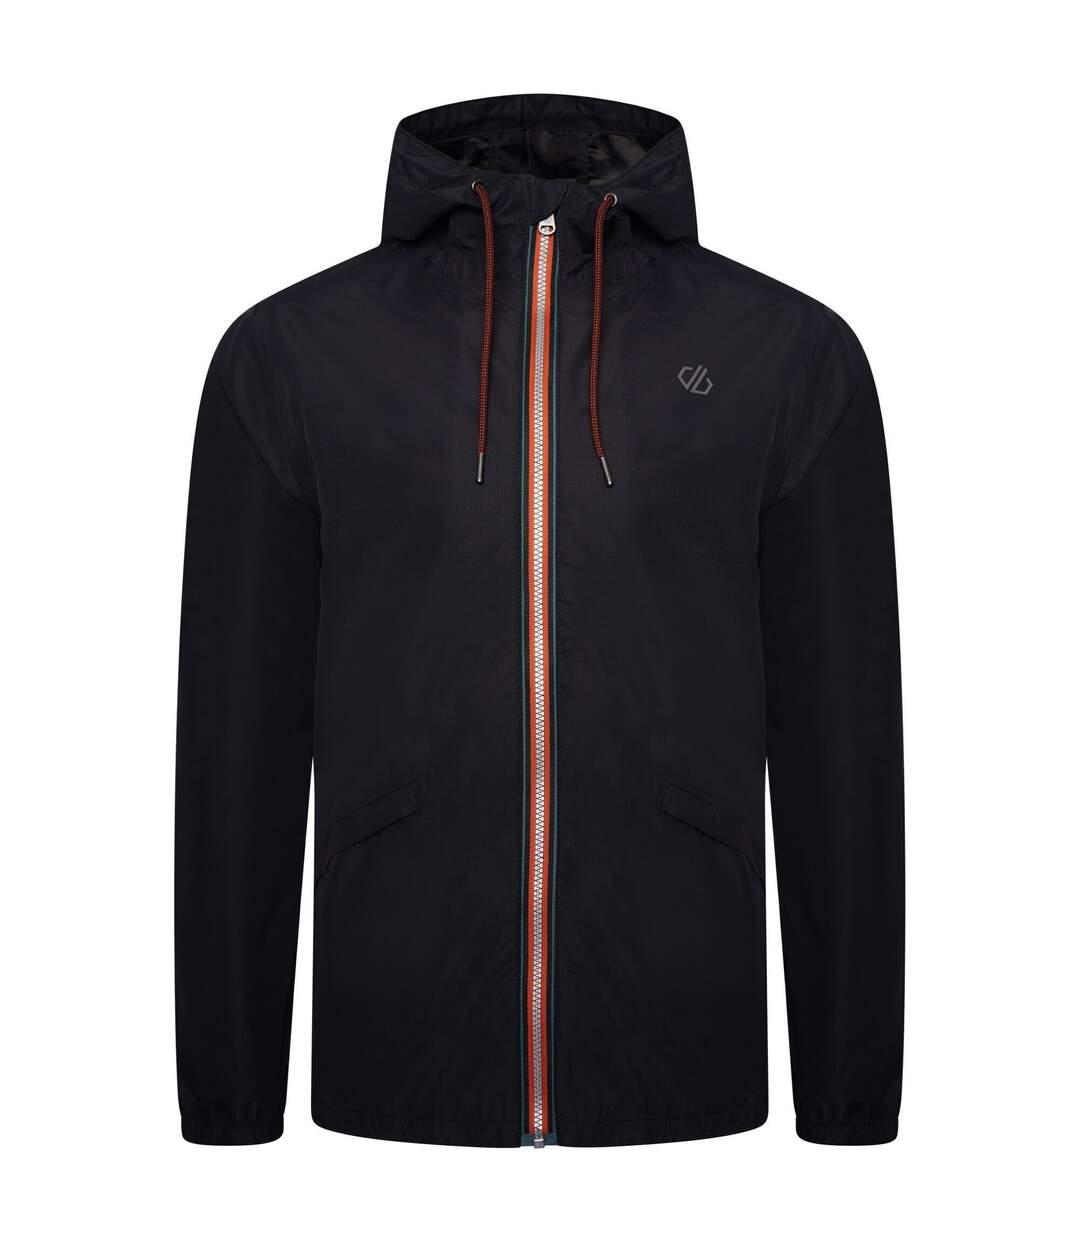 Dare 2B Mens Occupy Jenson Button Lightweight Jacket (Black) - UTRG5969